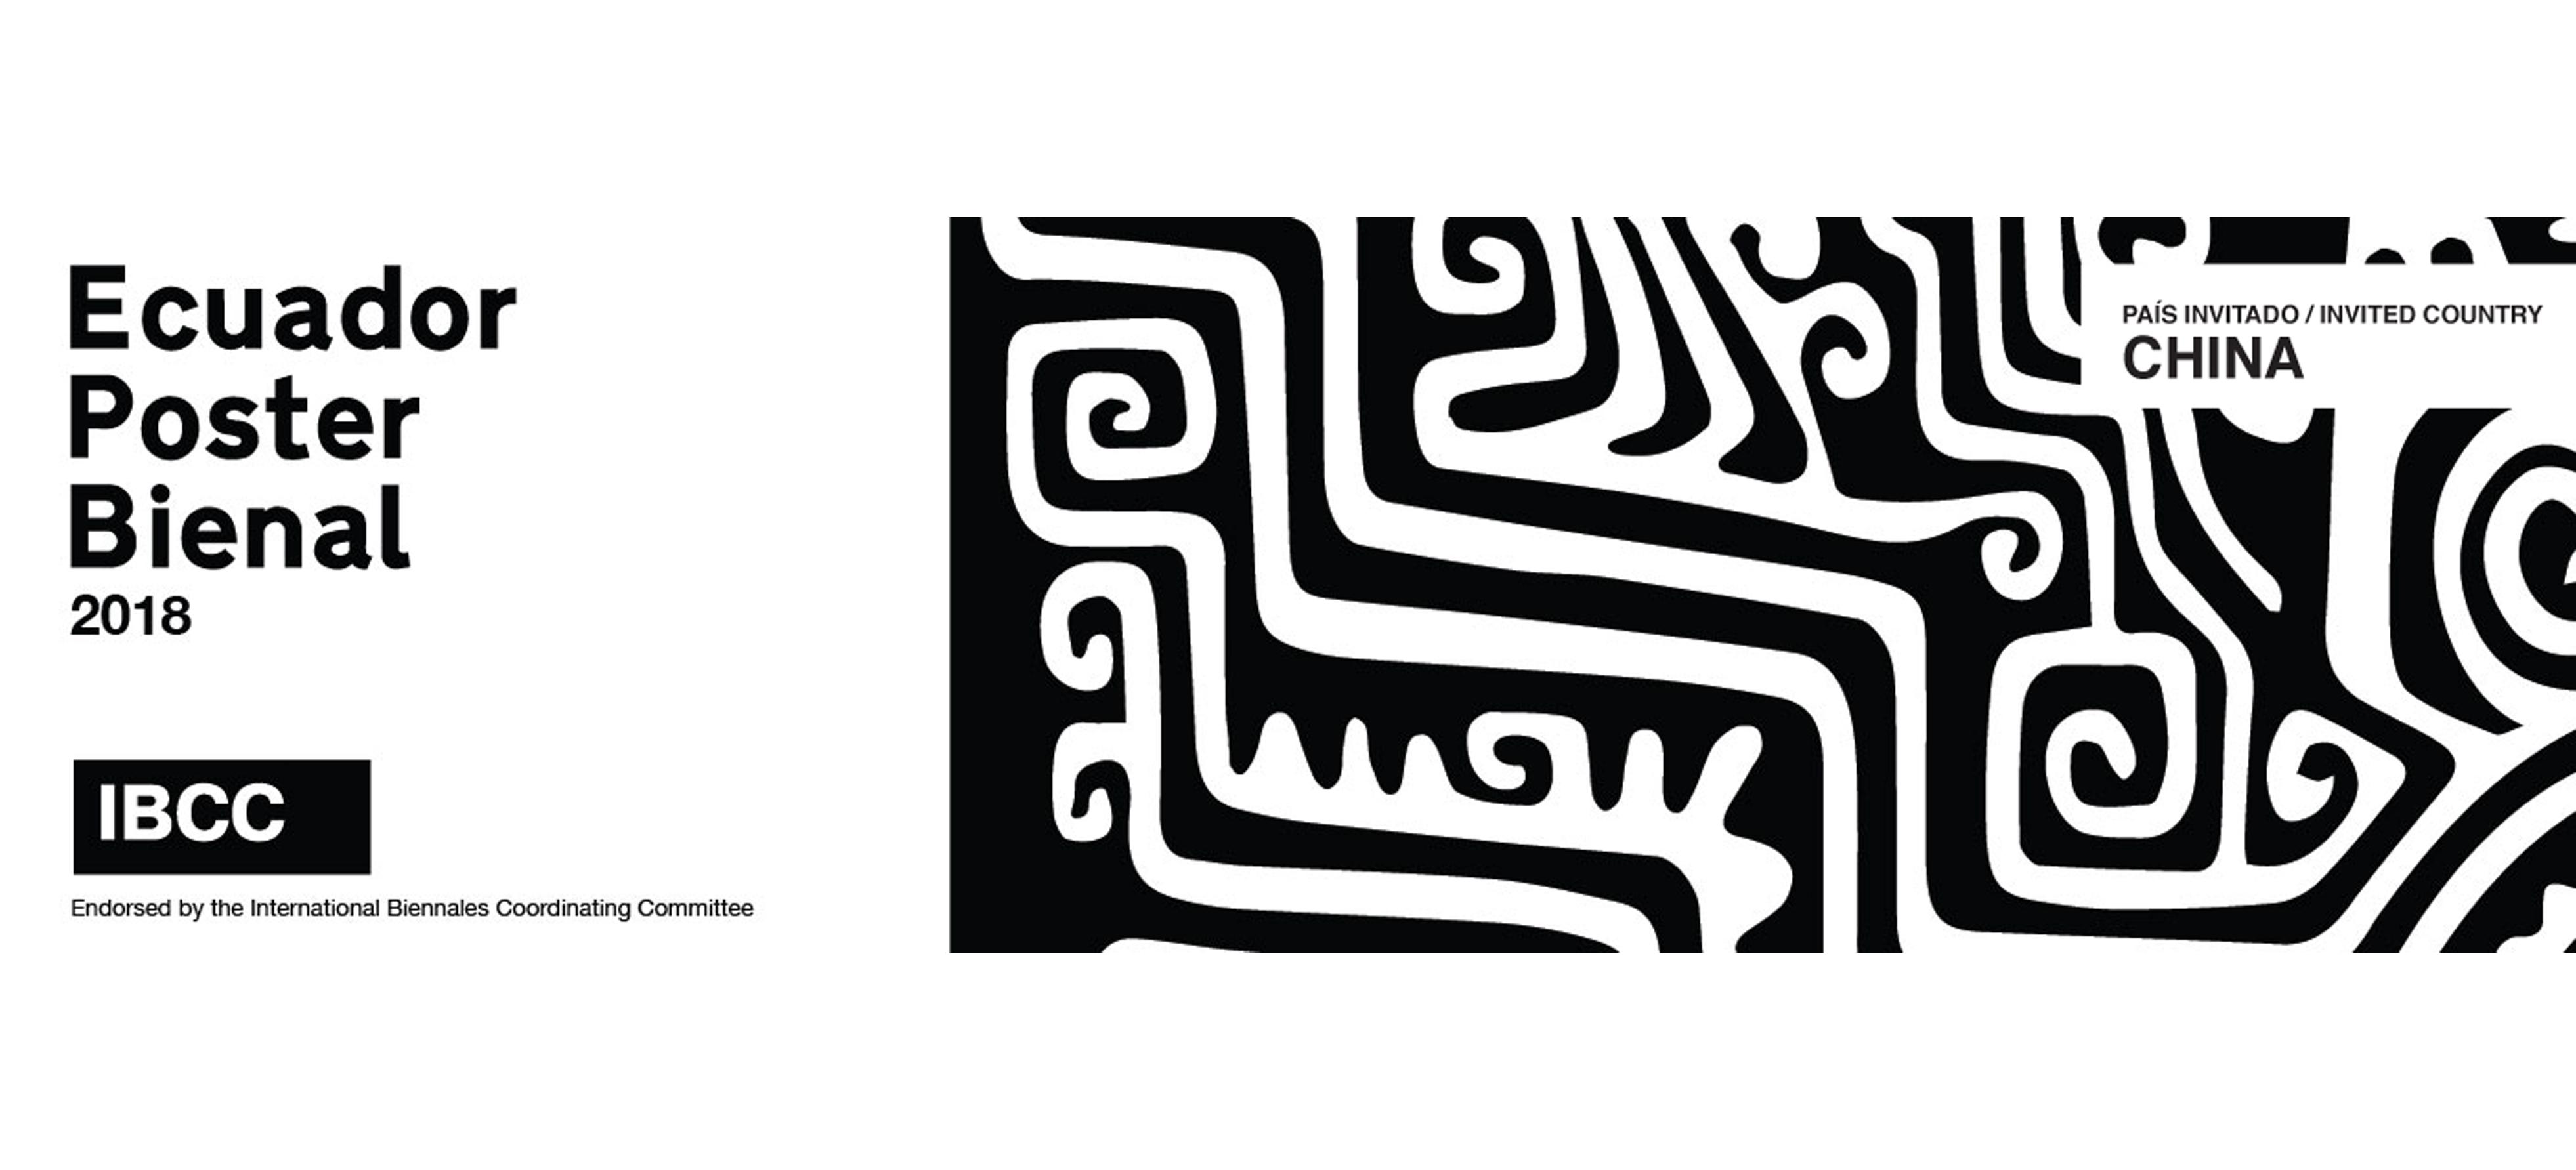 Ecuador Poster Bienal